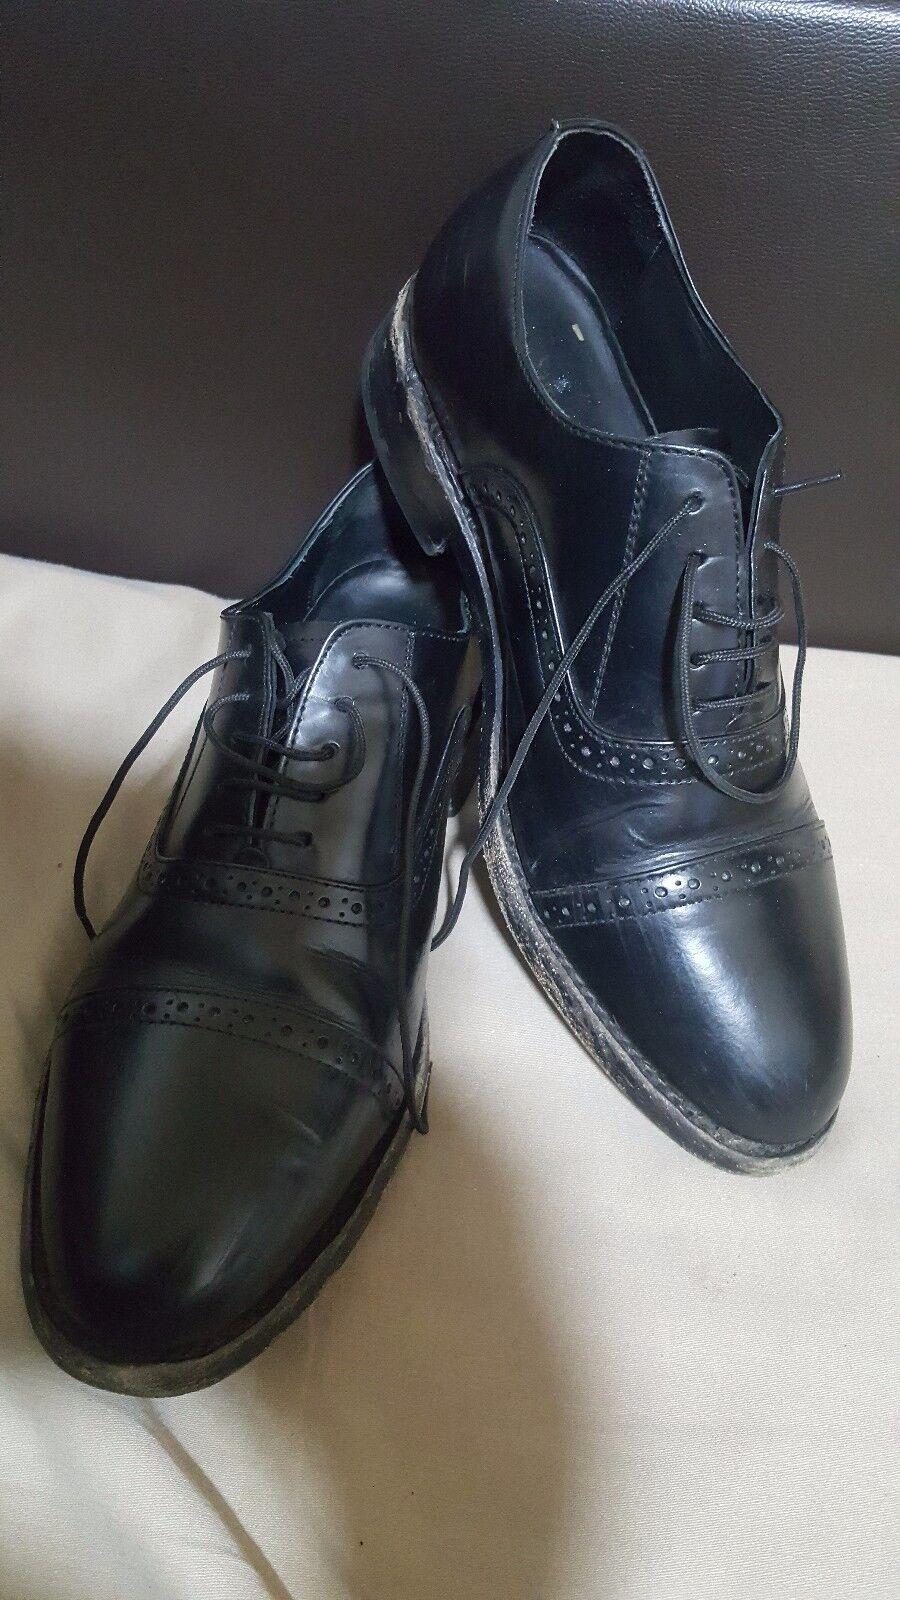 9190b408f897b SAMUEL WINDSOR ENGLAND Black Leather Men's shoes -size UK 8 EU 42 ...